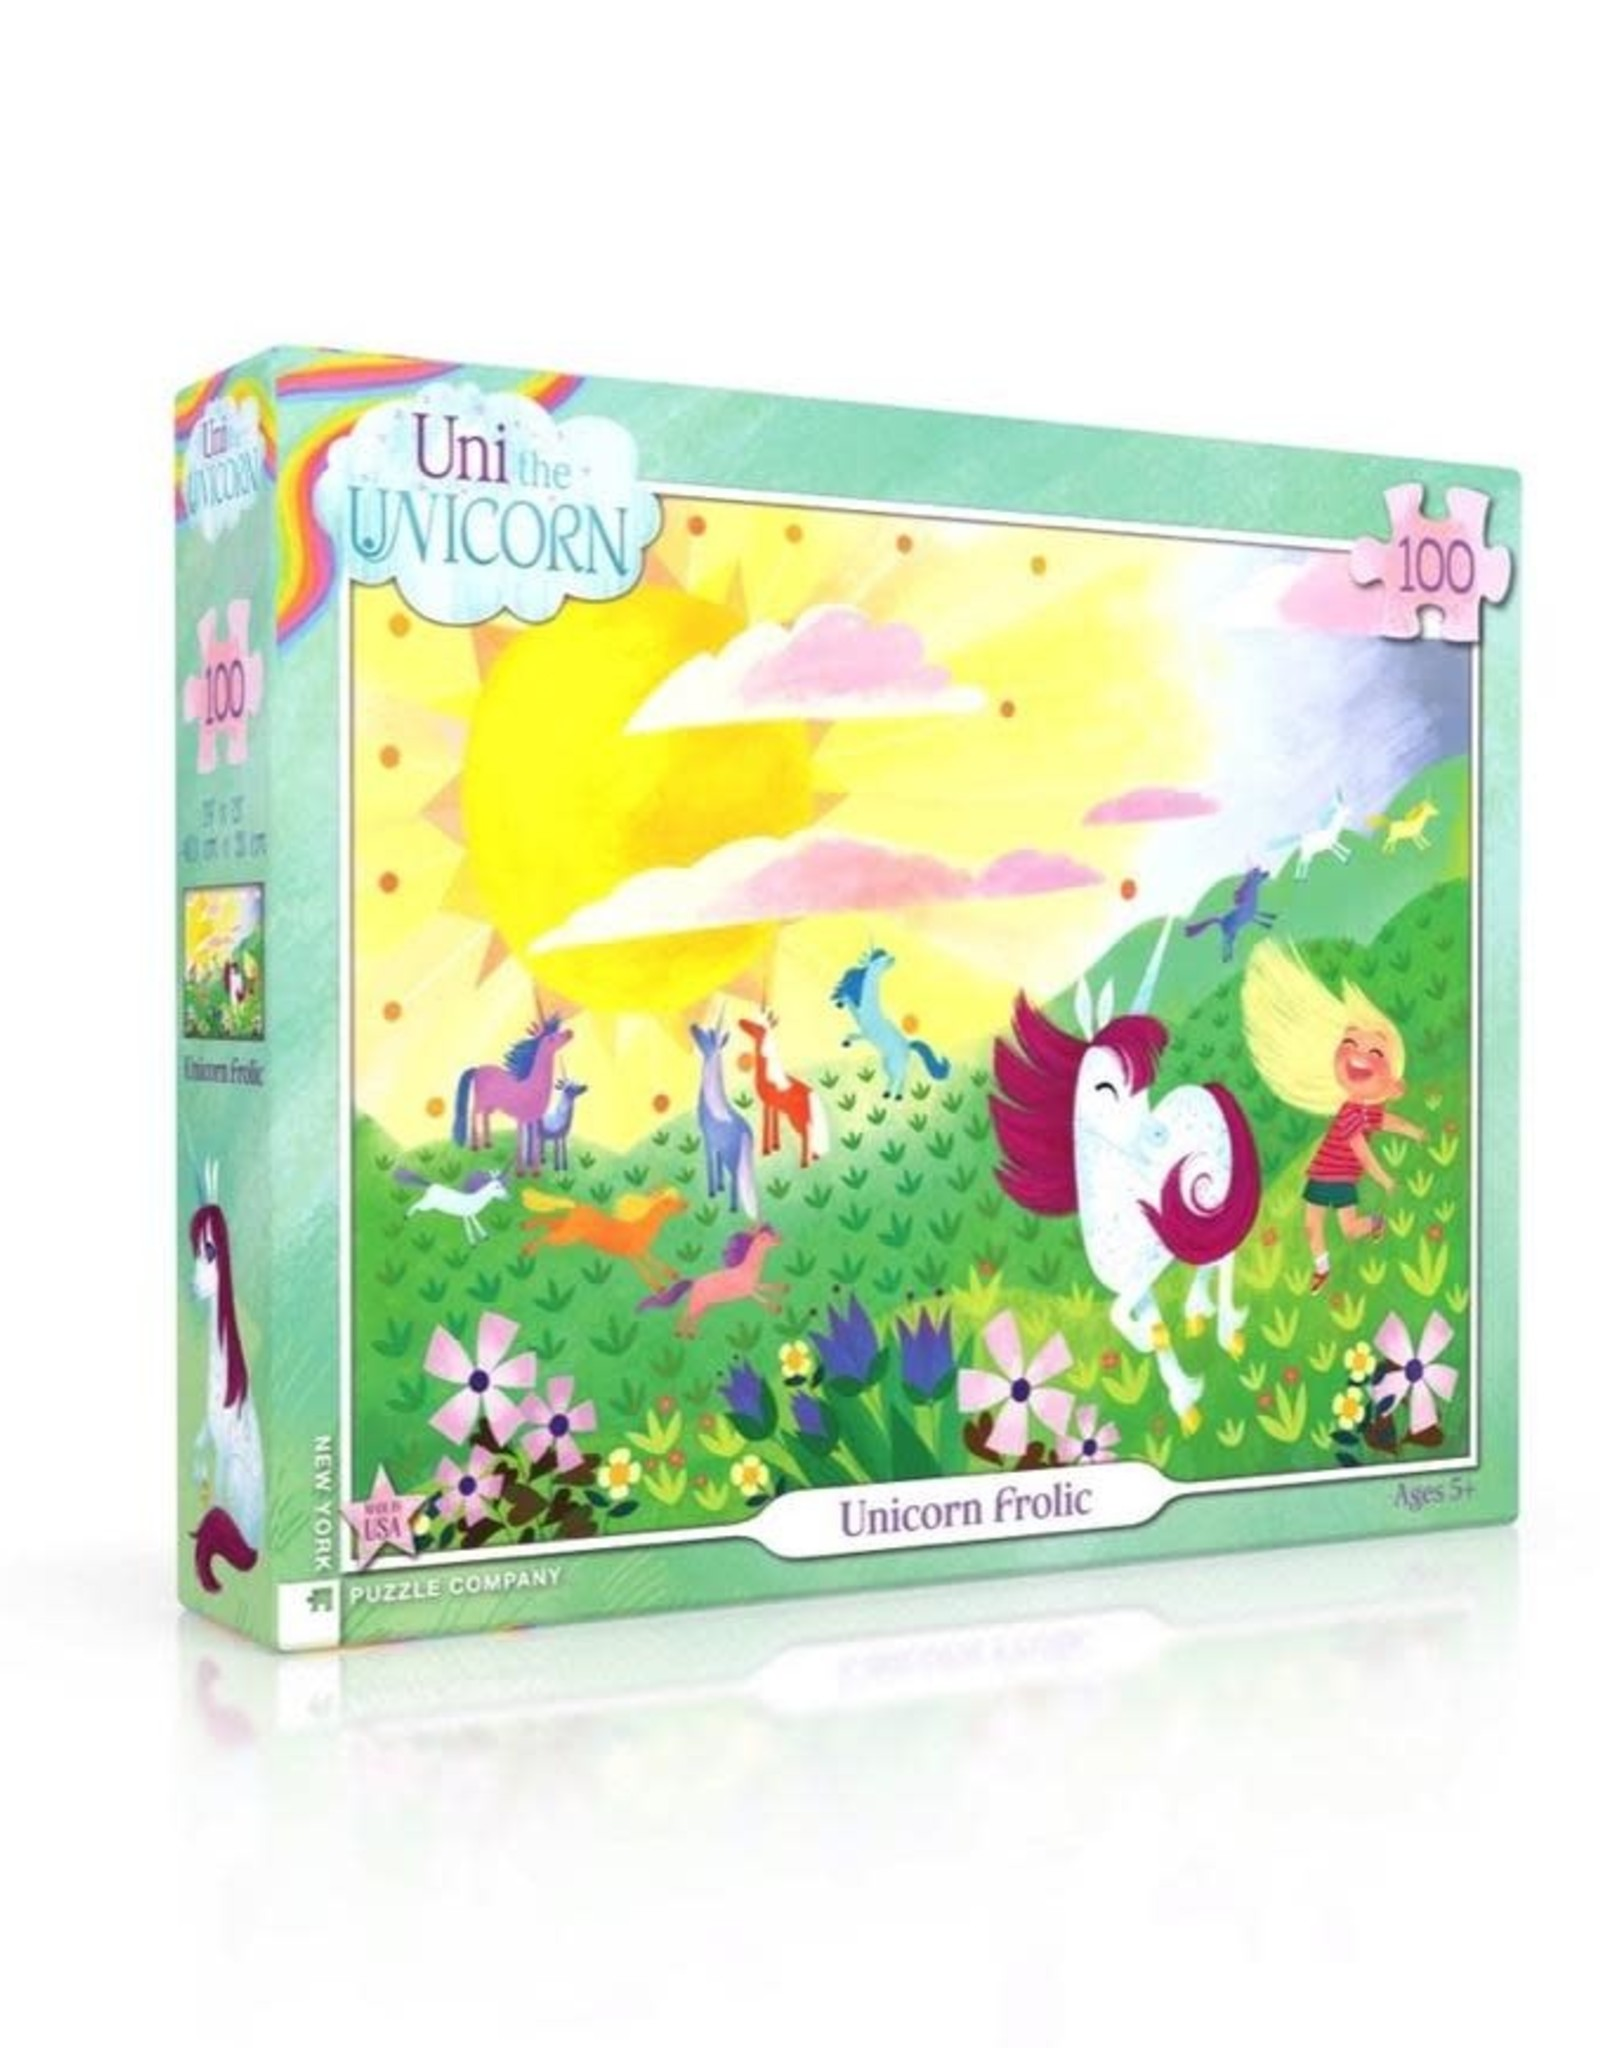 Unicorn Frolic 100 piece puzzle